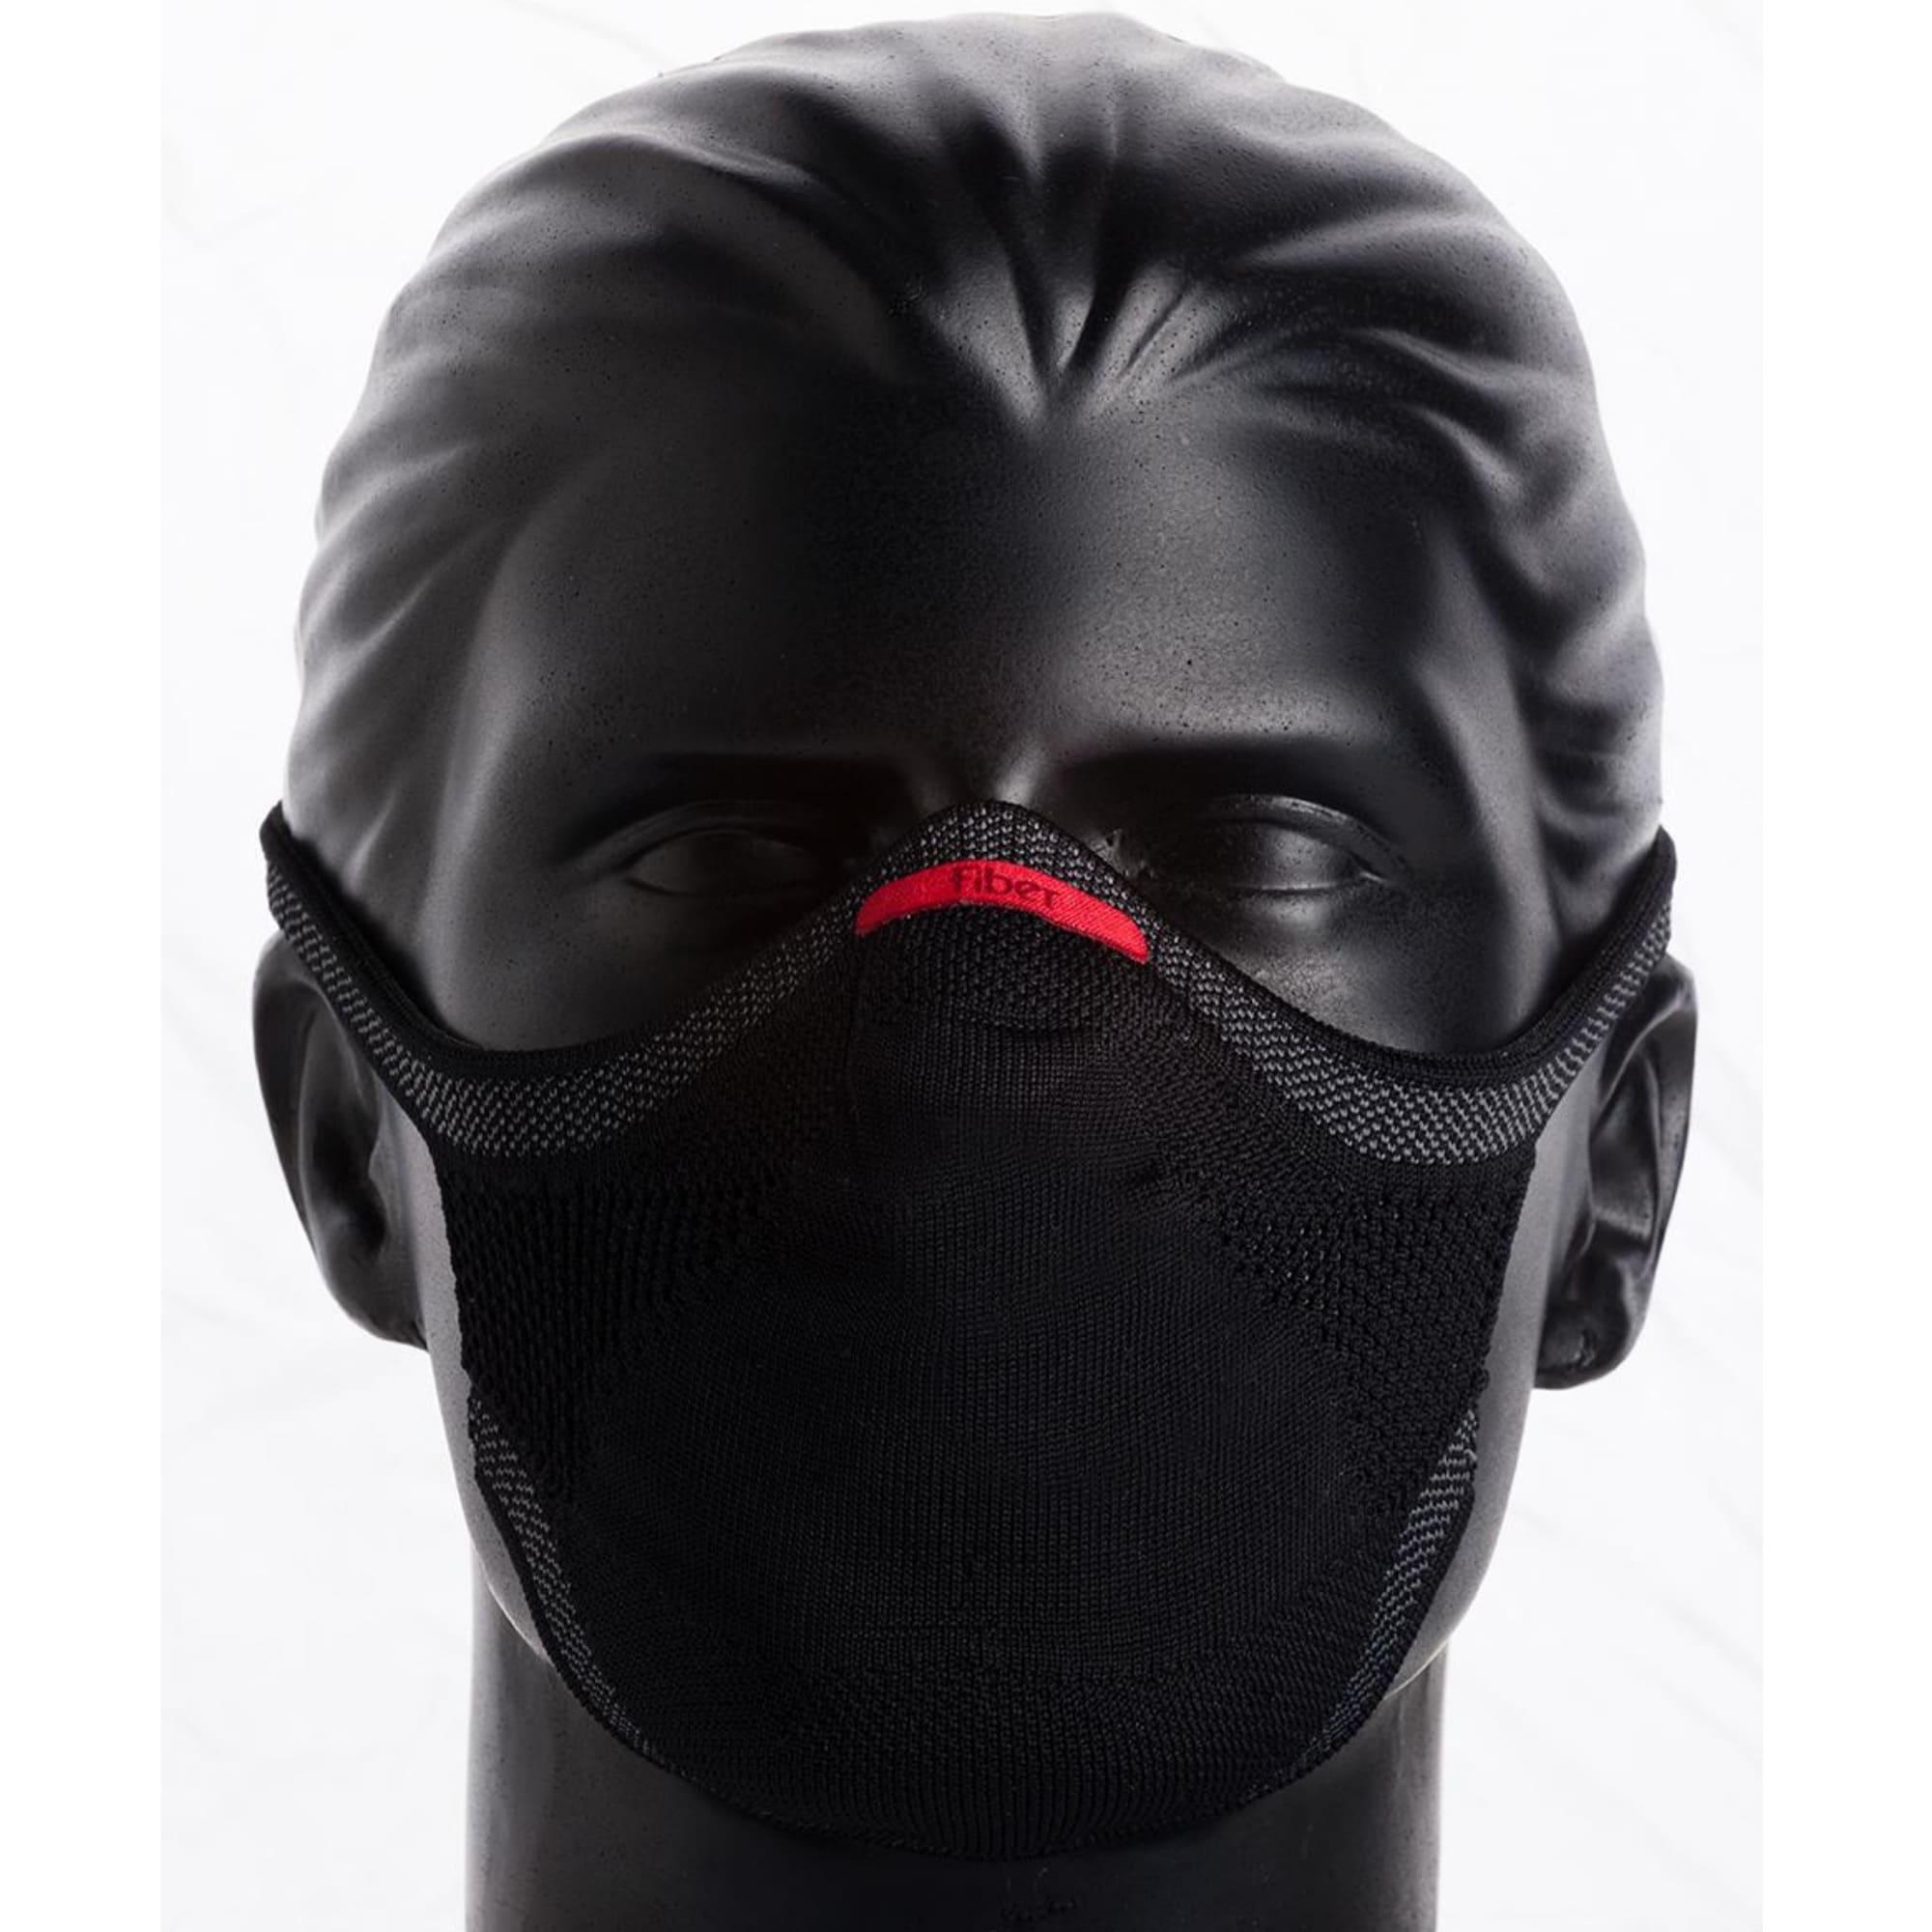 KIT 3 Máscaras + 3 Refis de Filtro + 3 Suportes